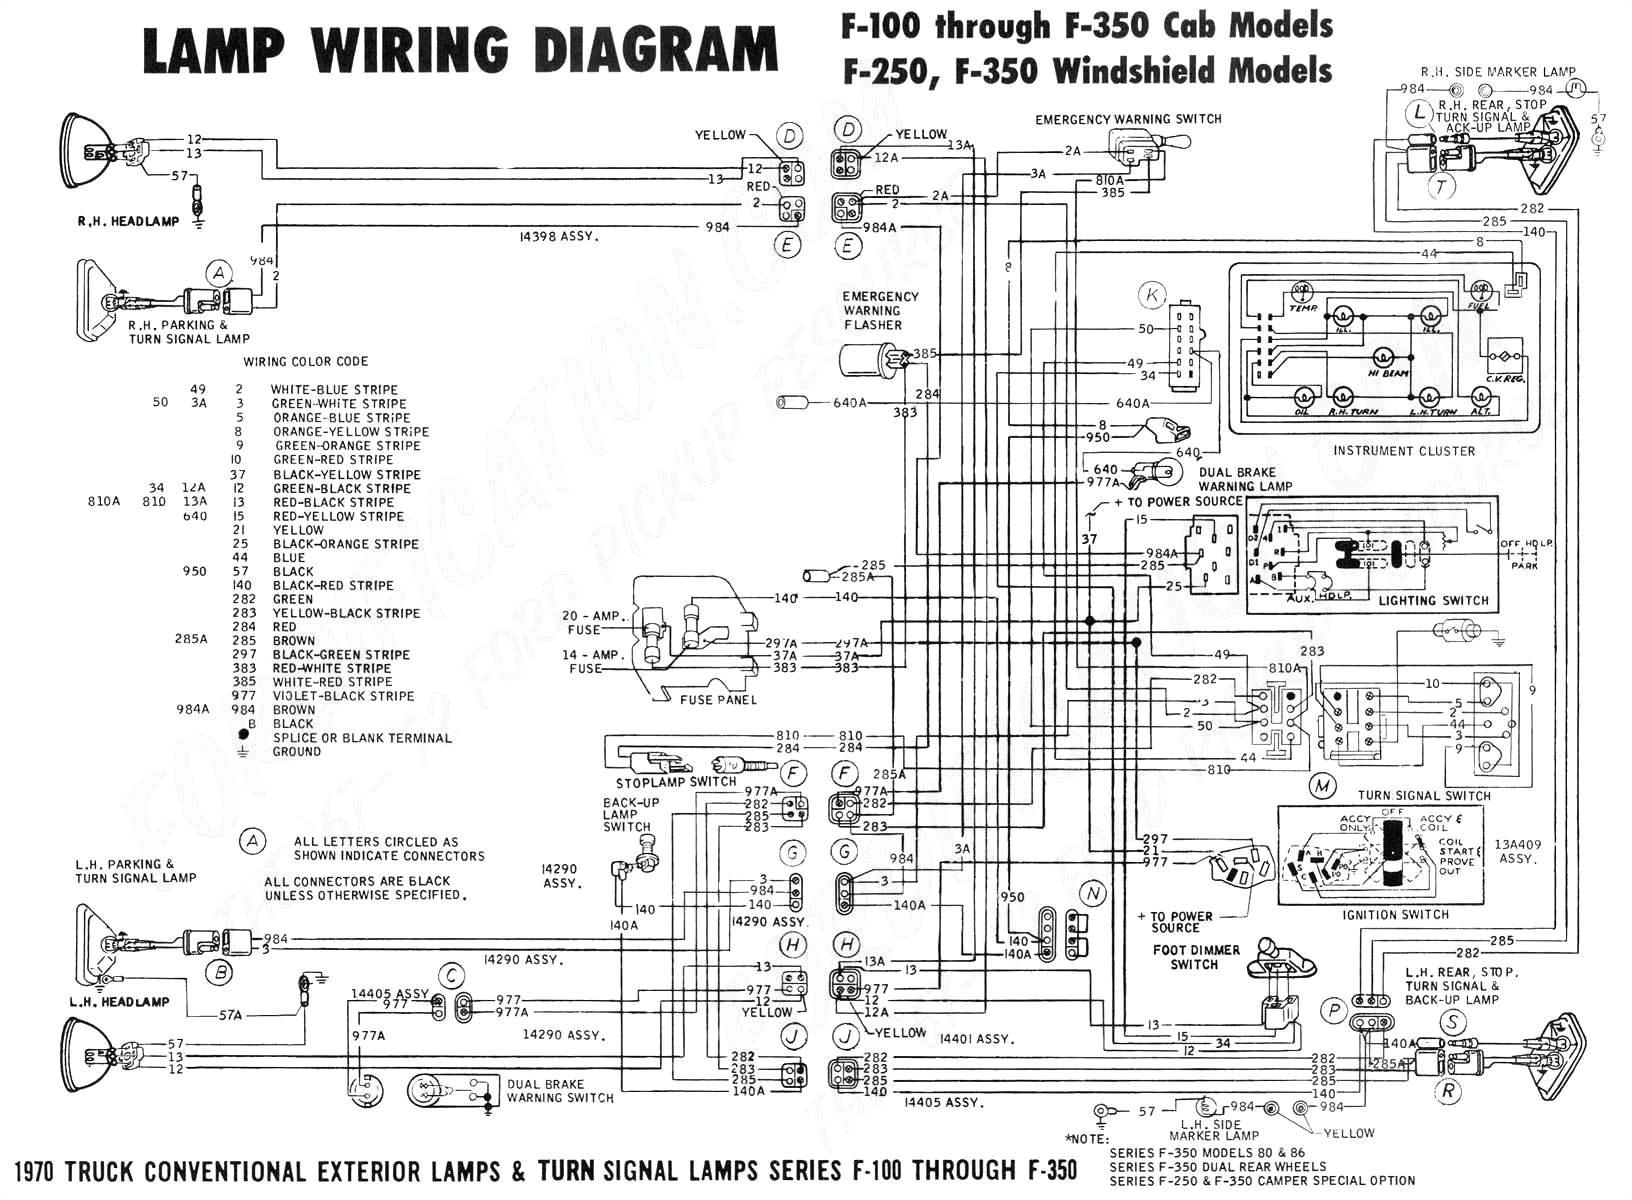 kenwood kdc 248u chevy kes diagram wiring diagram structure wiring diagram for kecc562gbl4 chevy kes diagram wiring diagram schematic